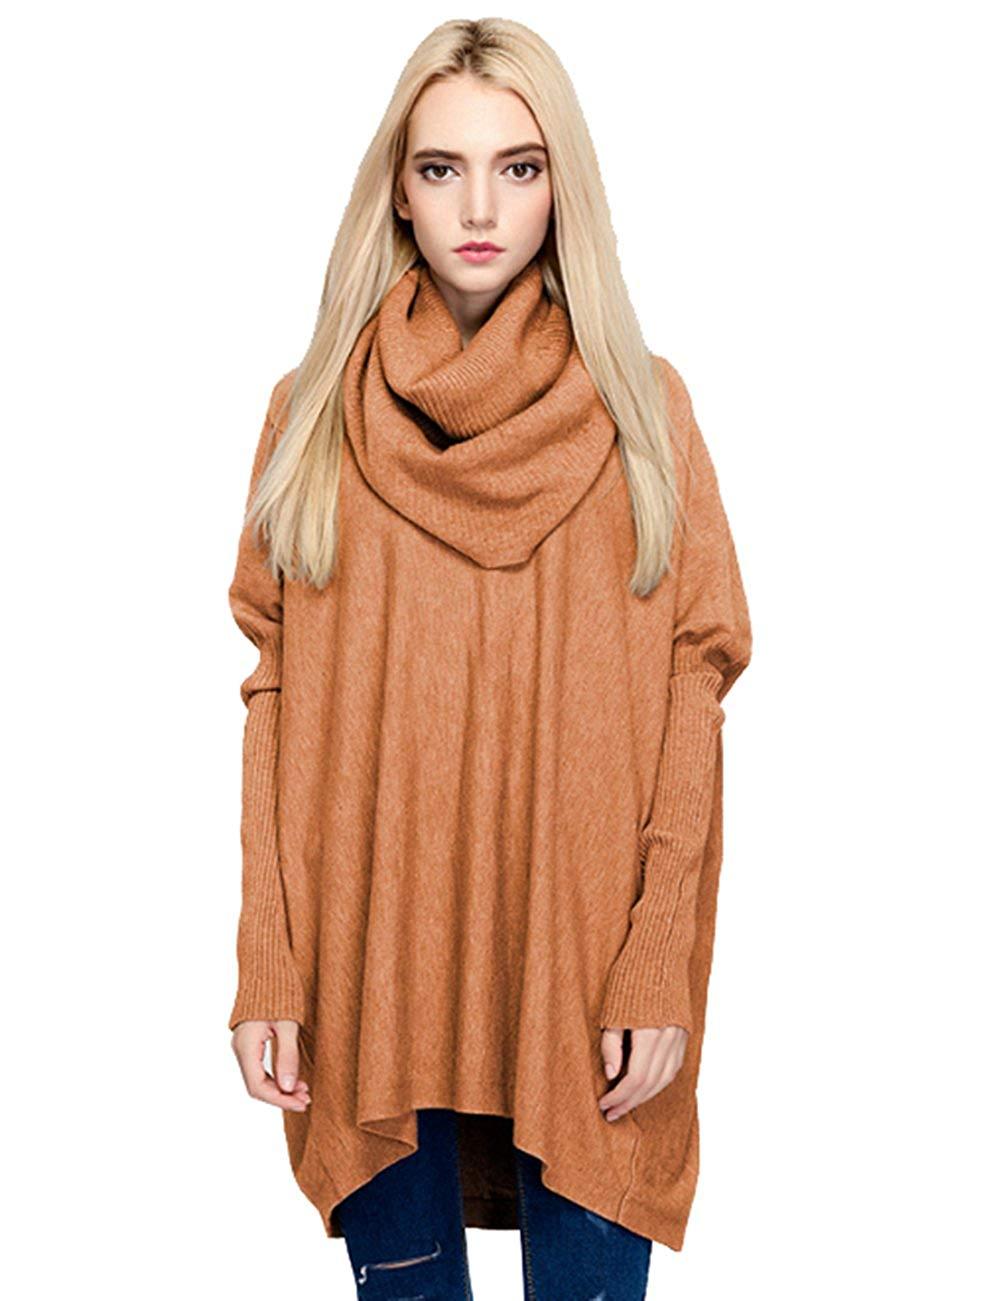 697179949 Cheap Oversized Turtleneck Sweater